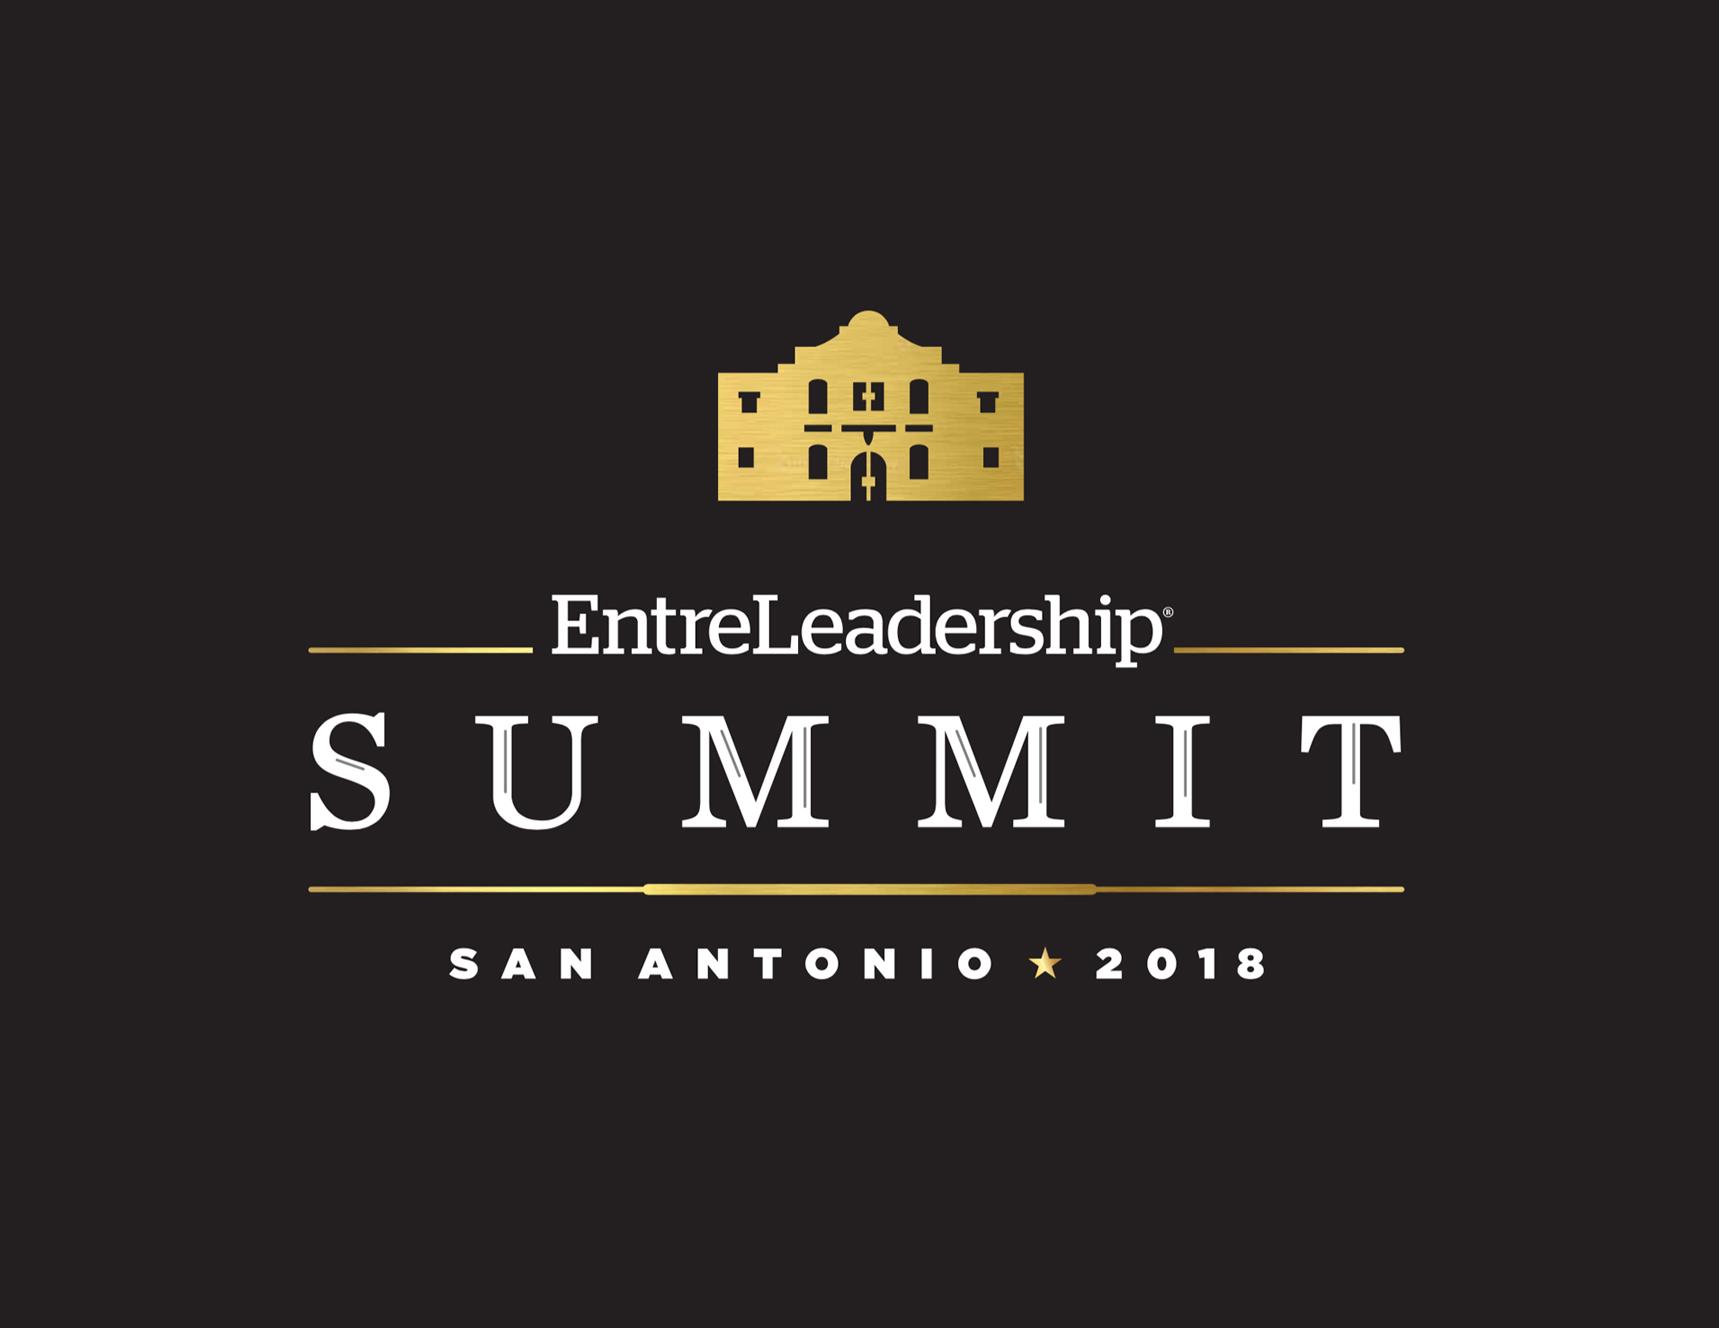 2018 Summit Logo - San Antonio